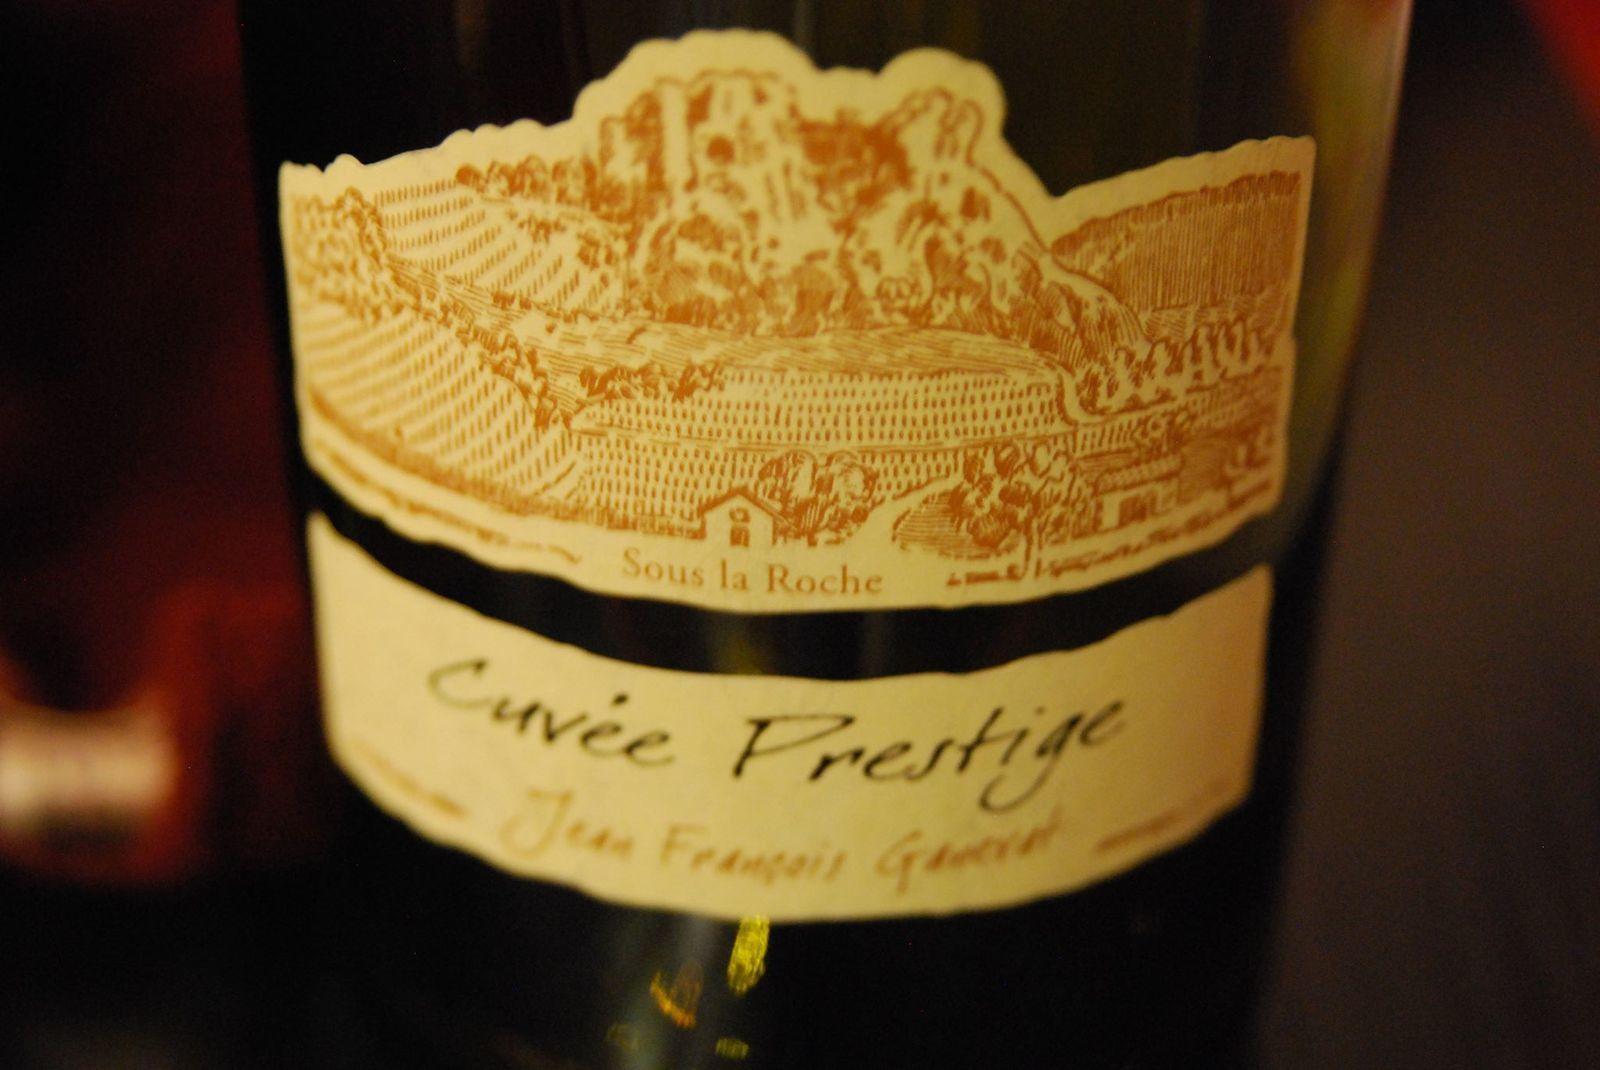 Domaine Ganevat - Cuvée Prestige - Côtes du Jura - Savagnin 2009